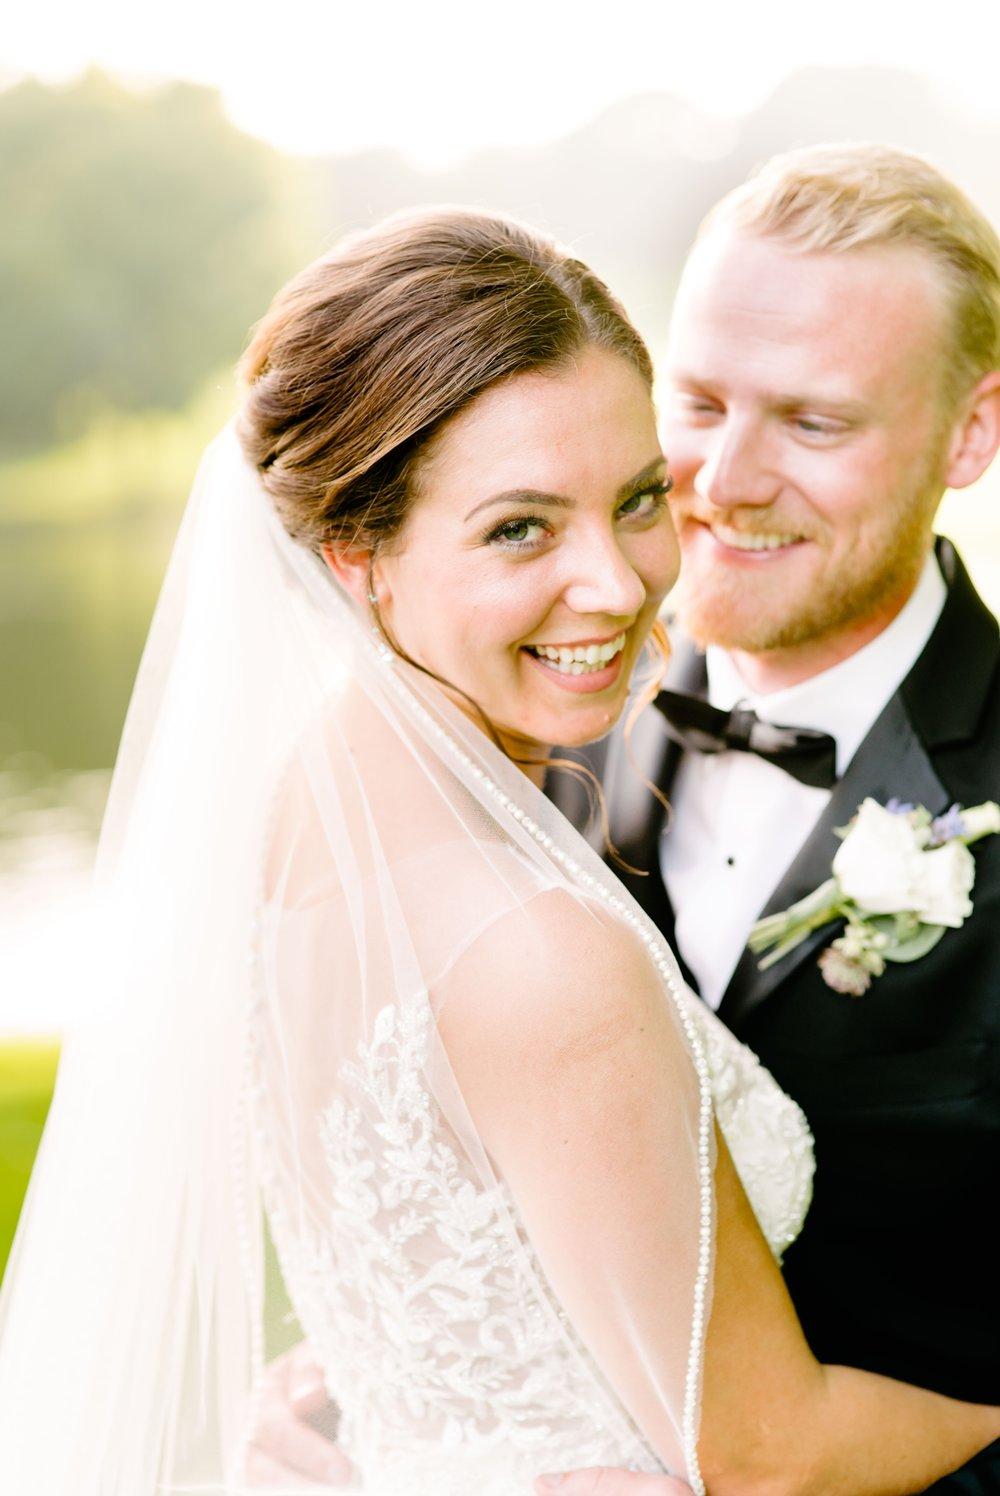 chicago-fine-art-wedding-photography-zuidema34